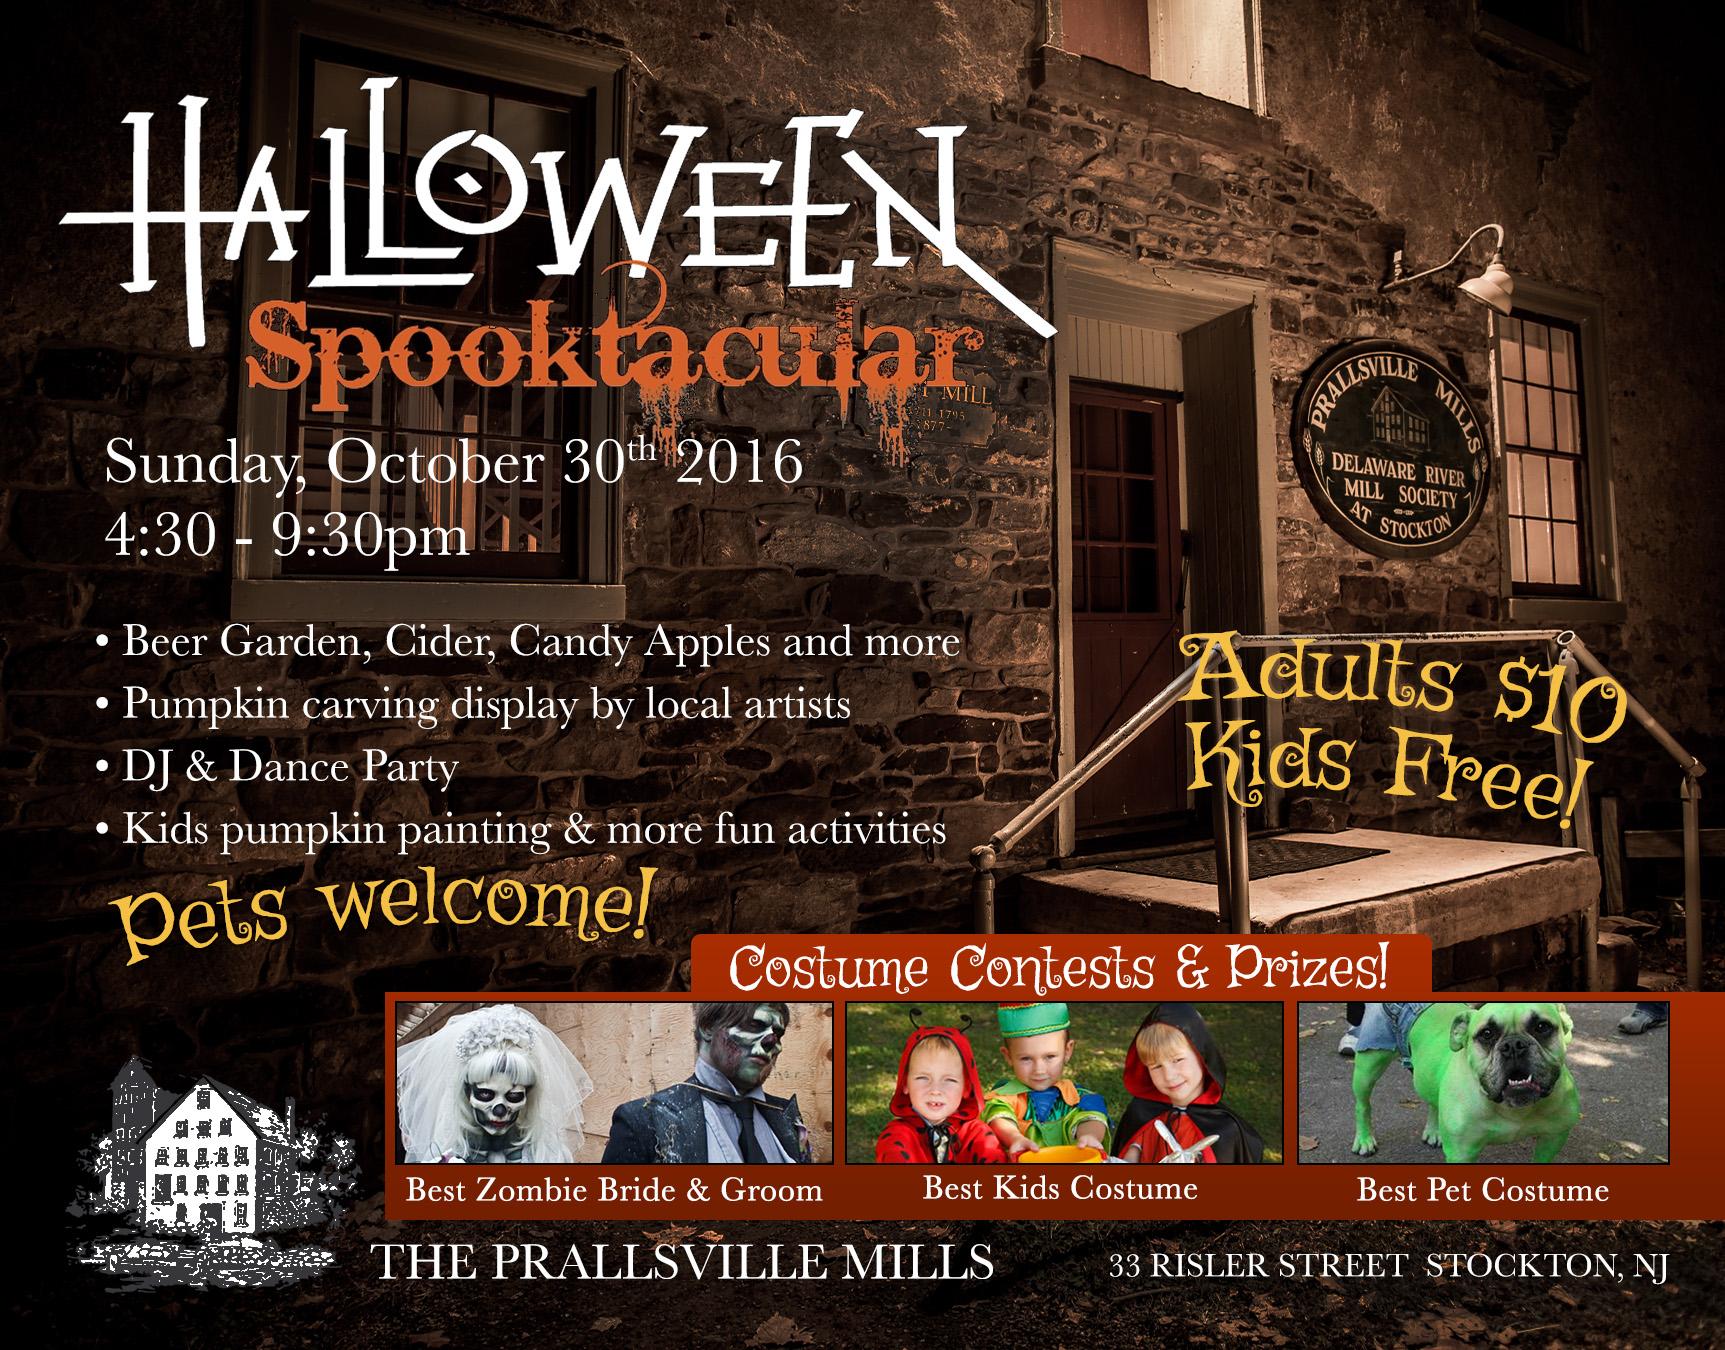 prallsville-halloween-spooktacular.jpg